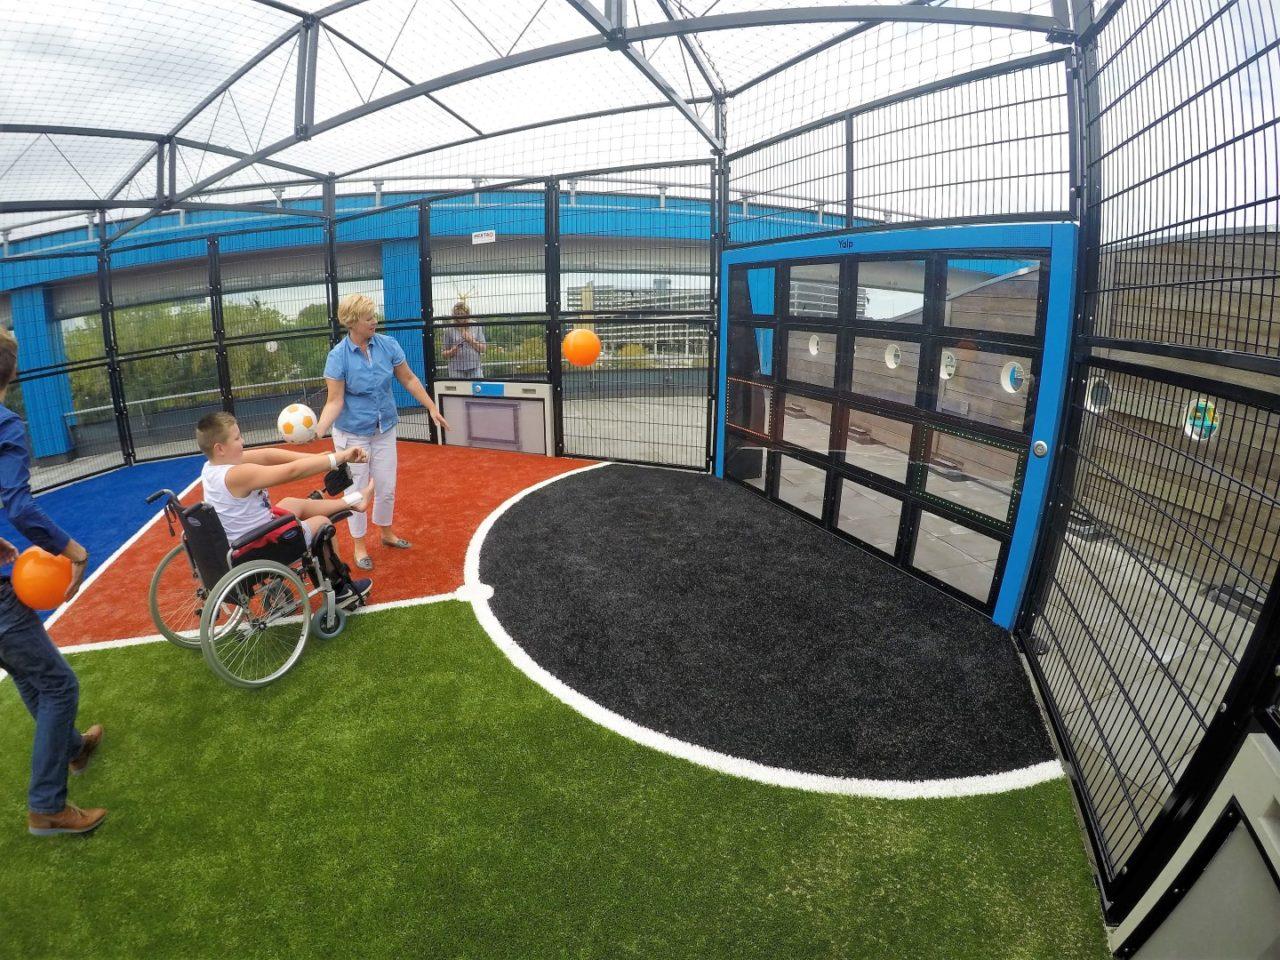 The Yalp Sutu | WKZ Hospital - Utrecht, The Netherlands